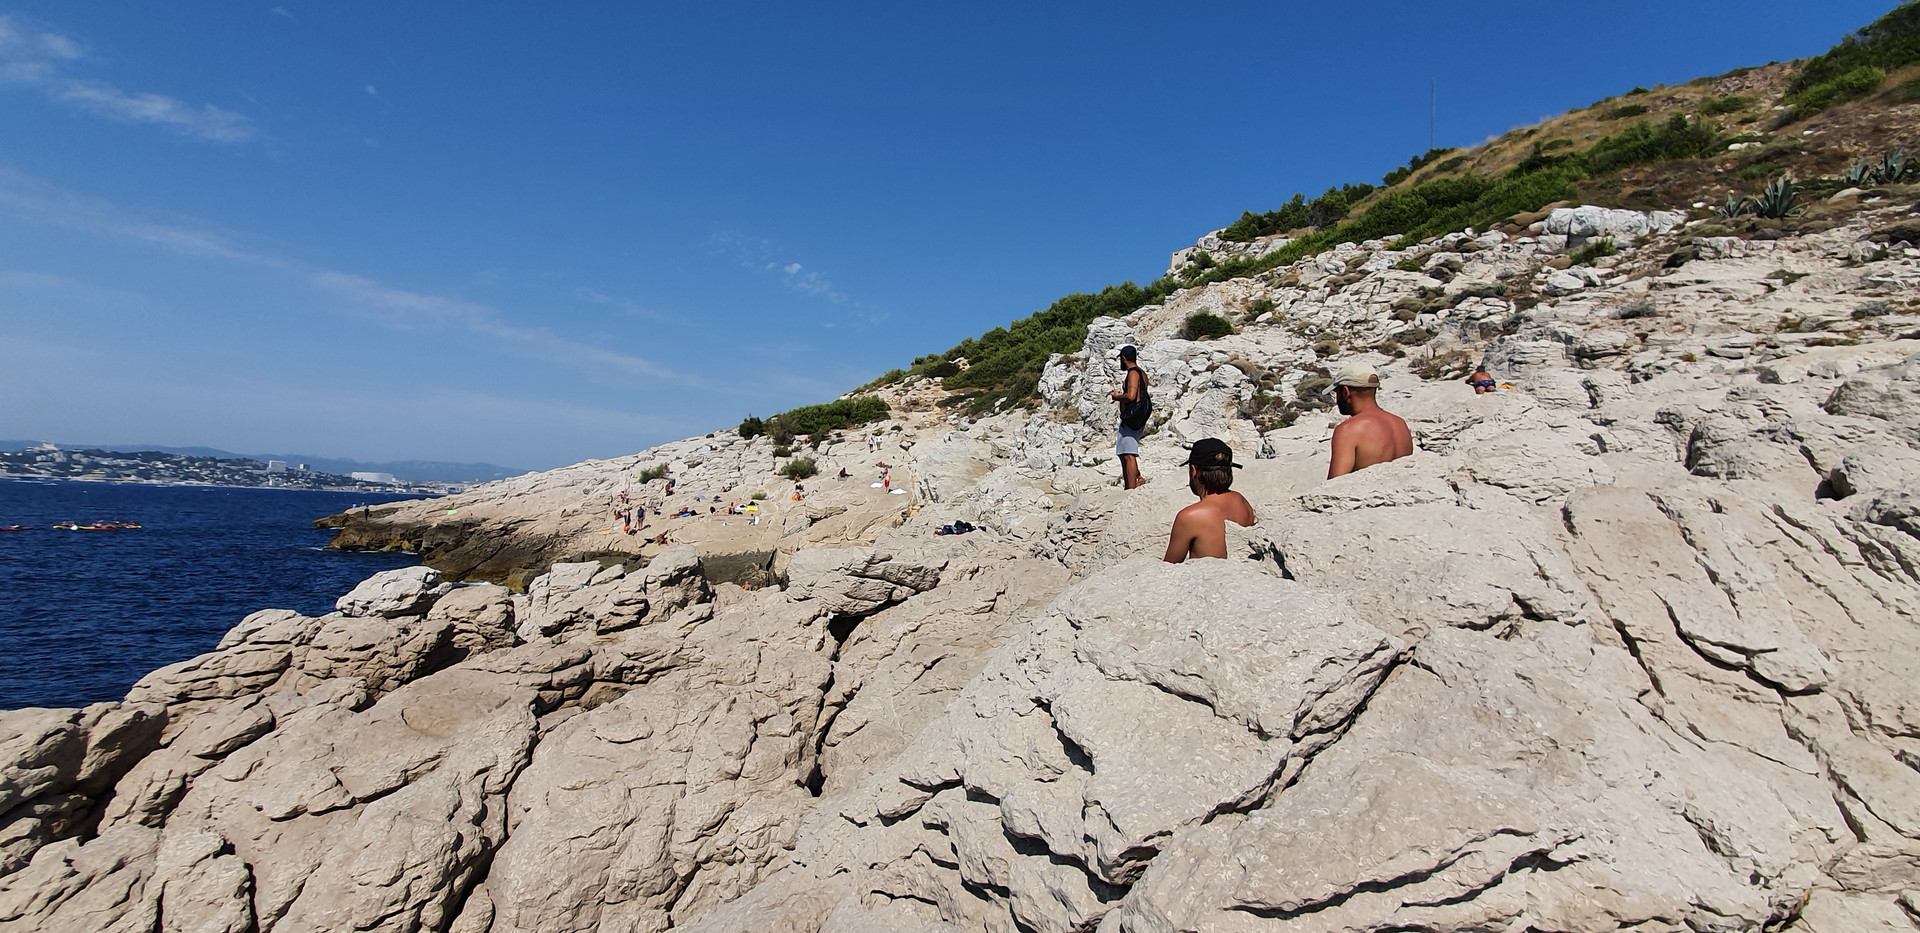 Gorgeous gay rocky beach!